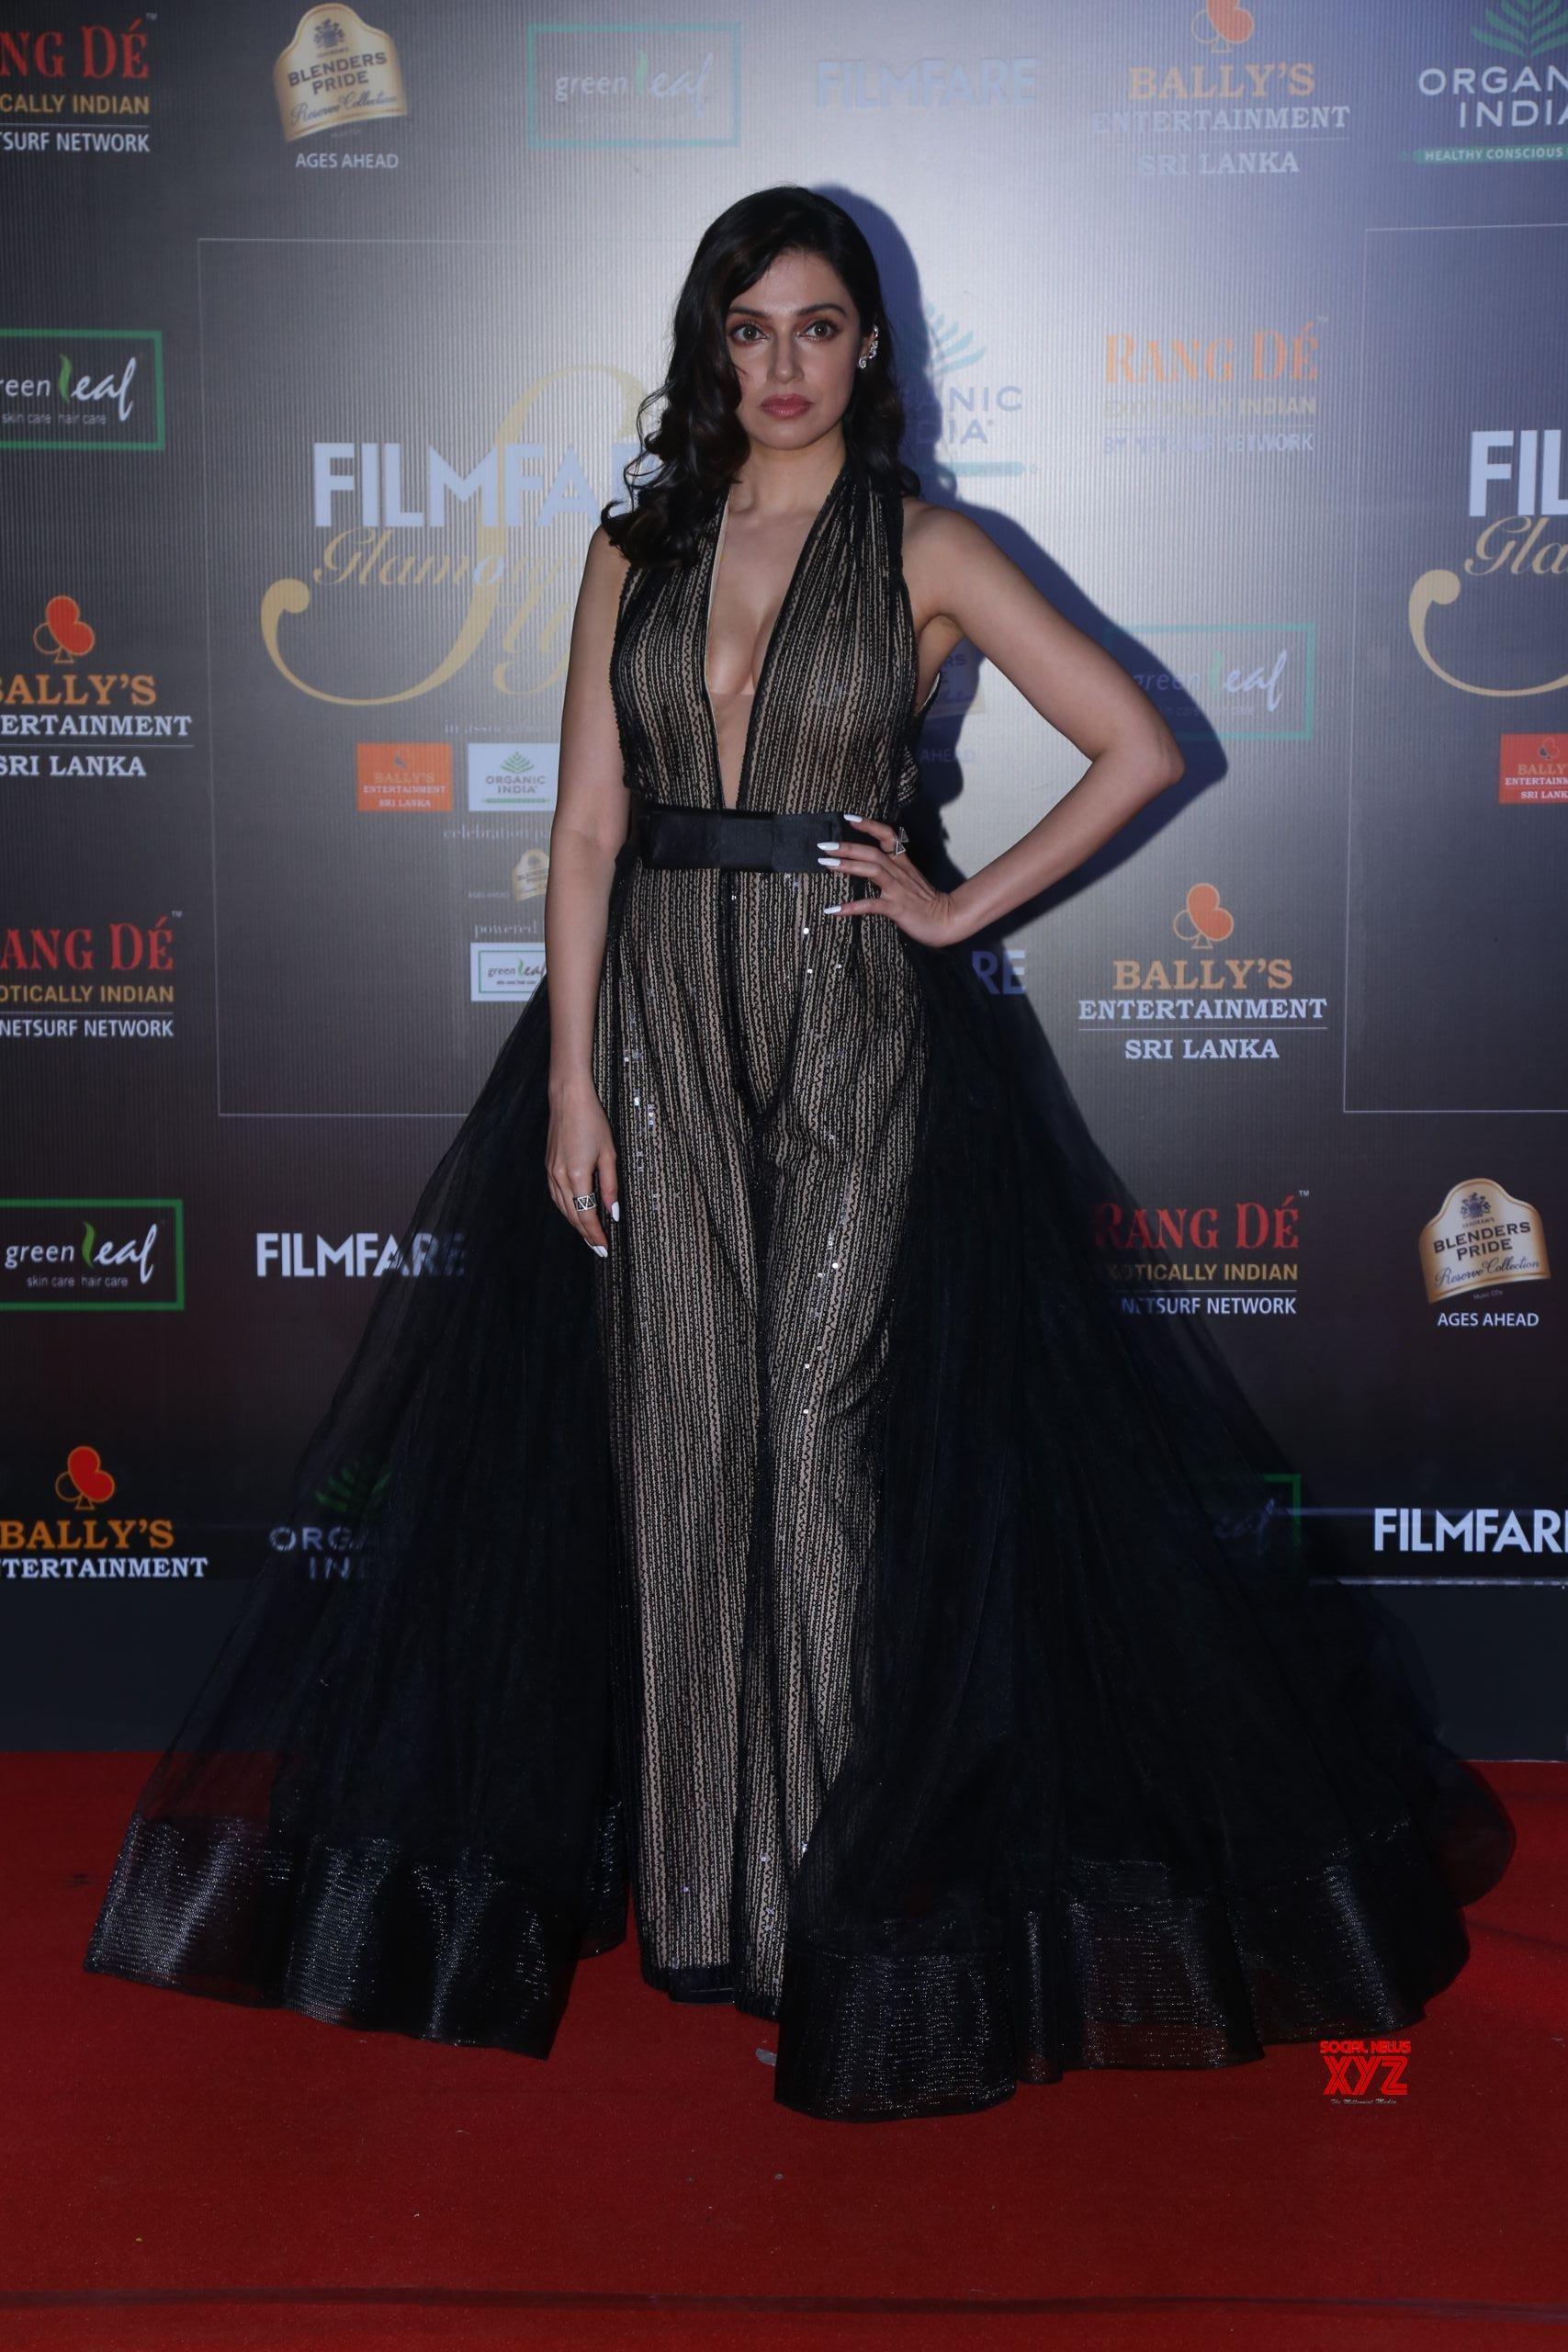 Actress Divya Khosla Kumar  Hot HD Stills From Filmfare Glamour And Style Awards 2019 Red Carpet